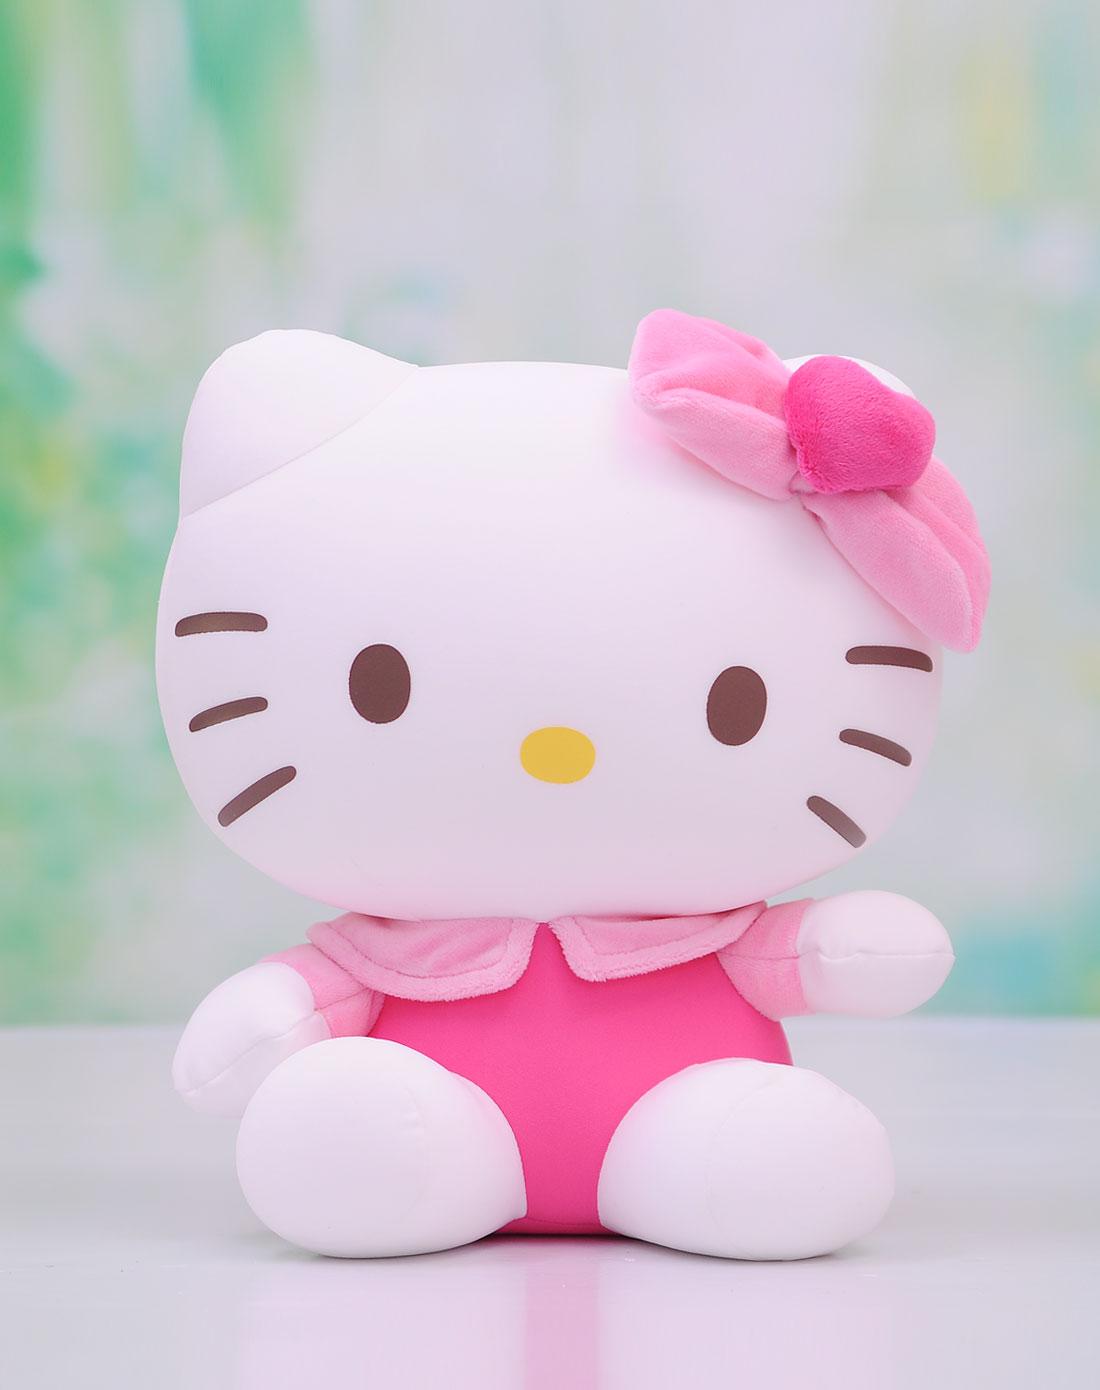 hello kitty 28cm粒子玩具-粉色凯蒂猫